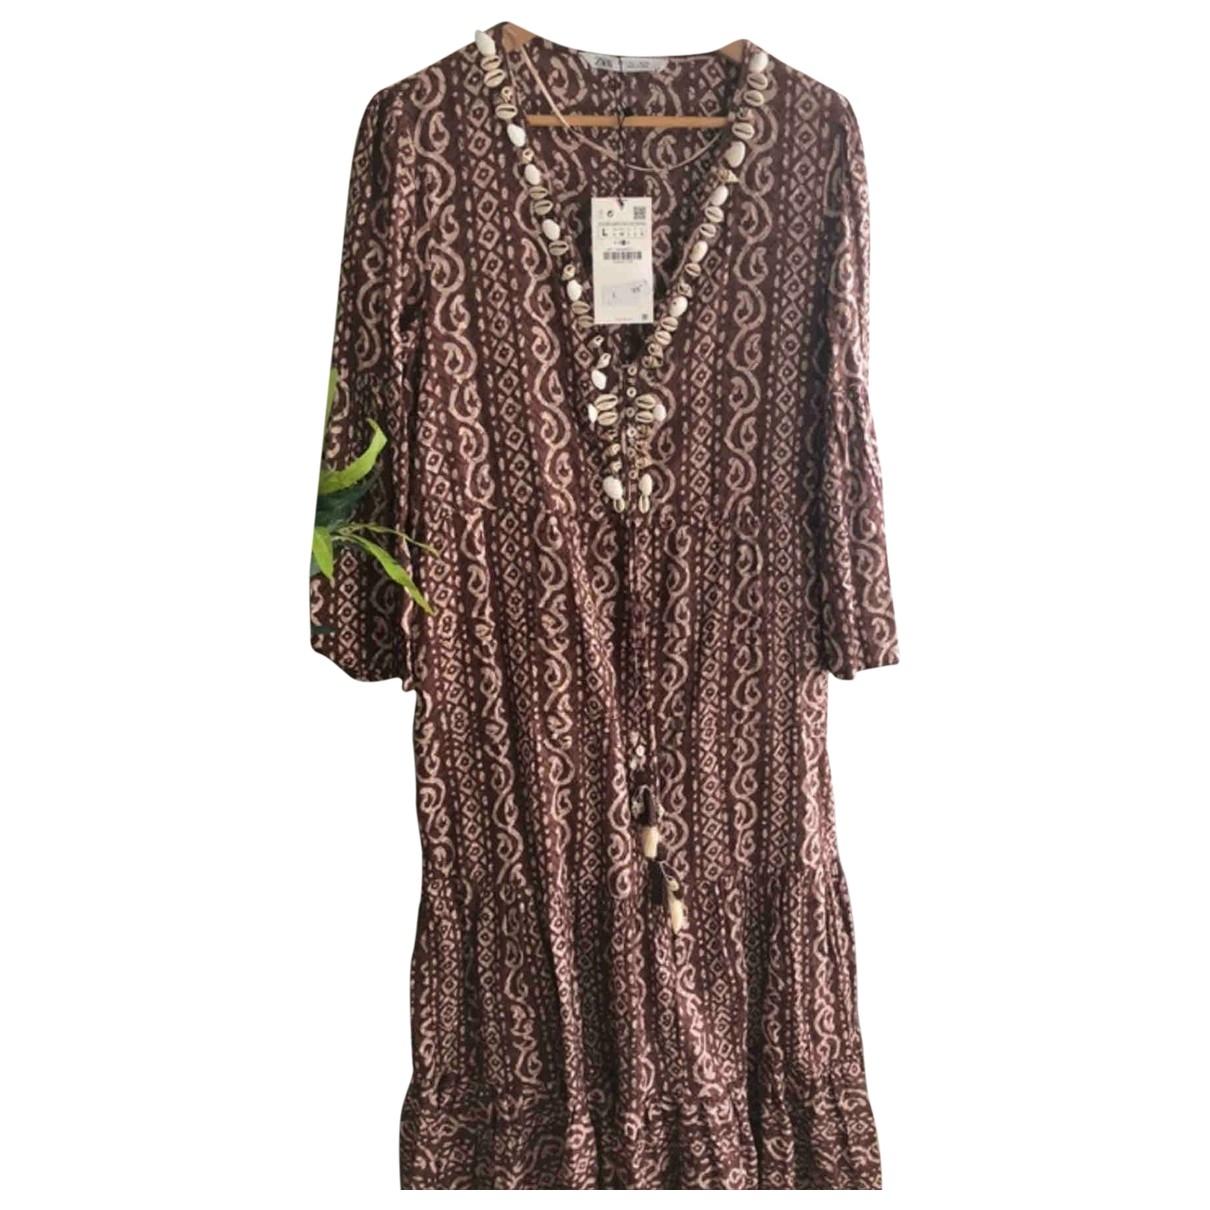 Zara \N Brown Cotton dress for Women L International